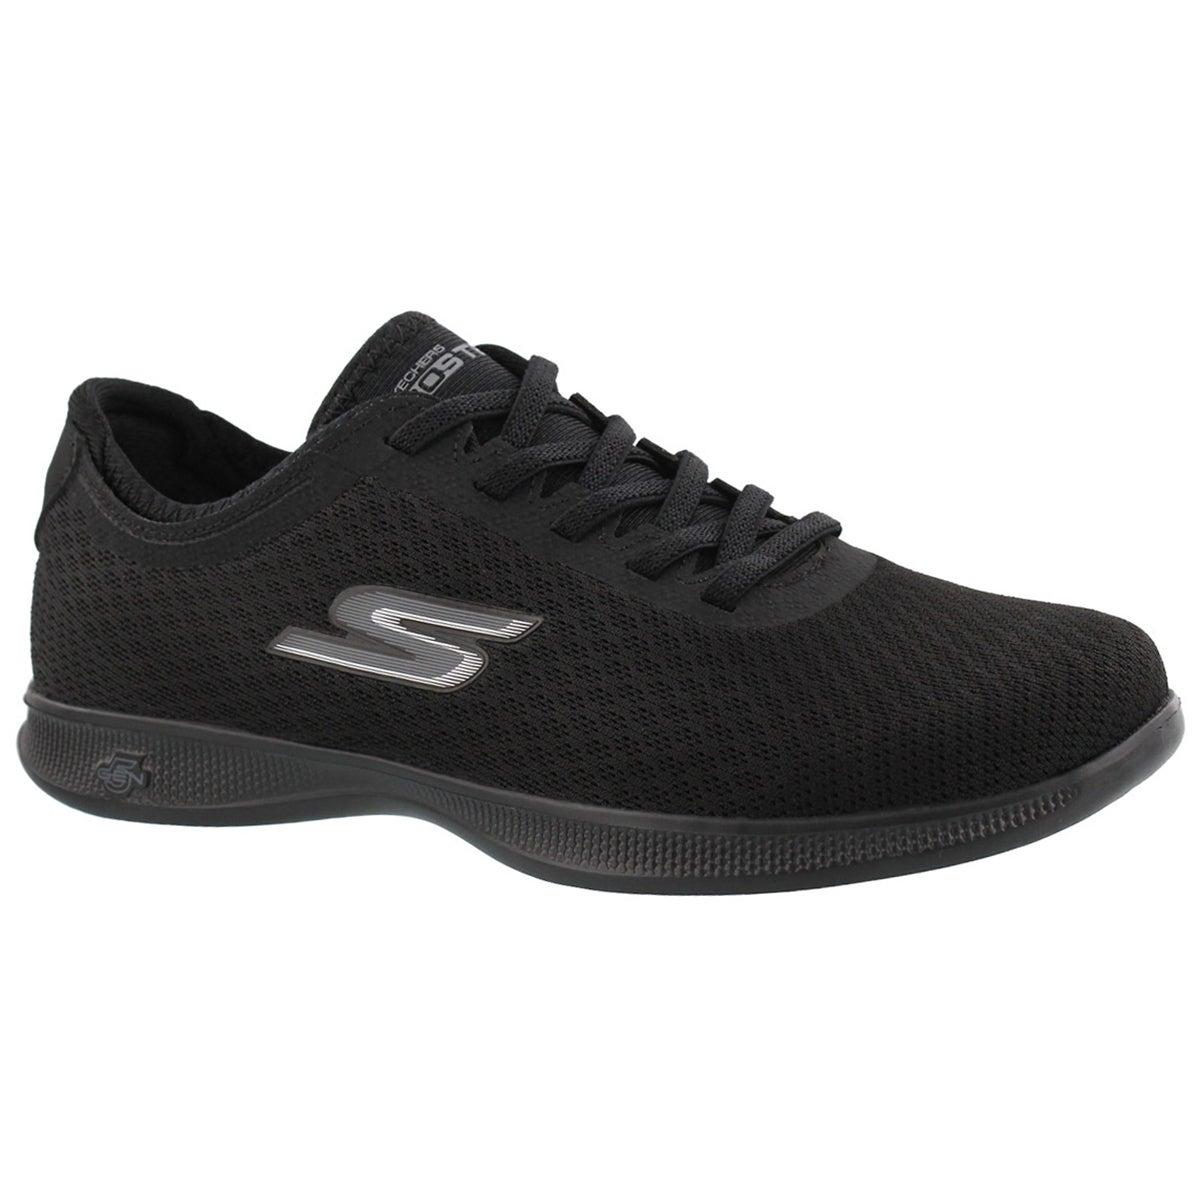 Women's GOstep lite DASHING black sneaker